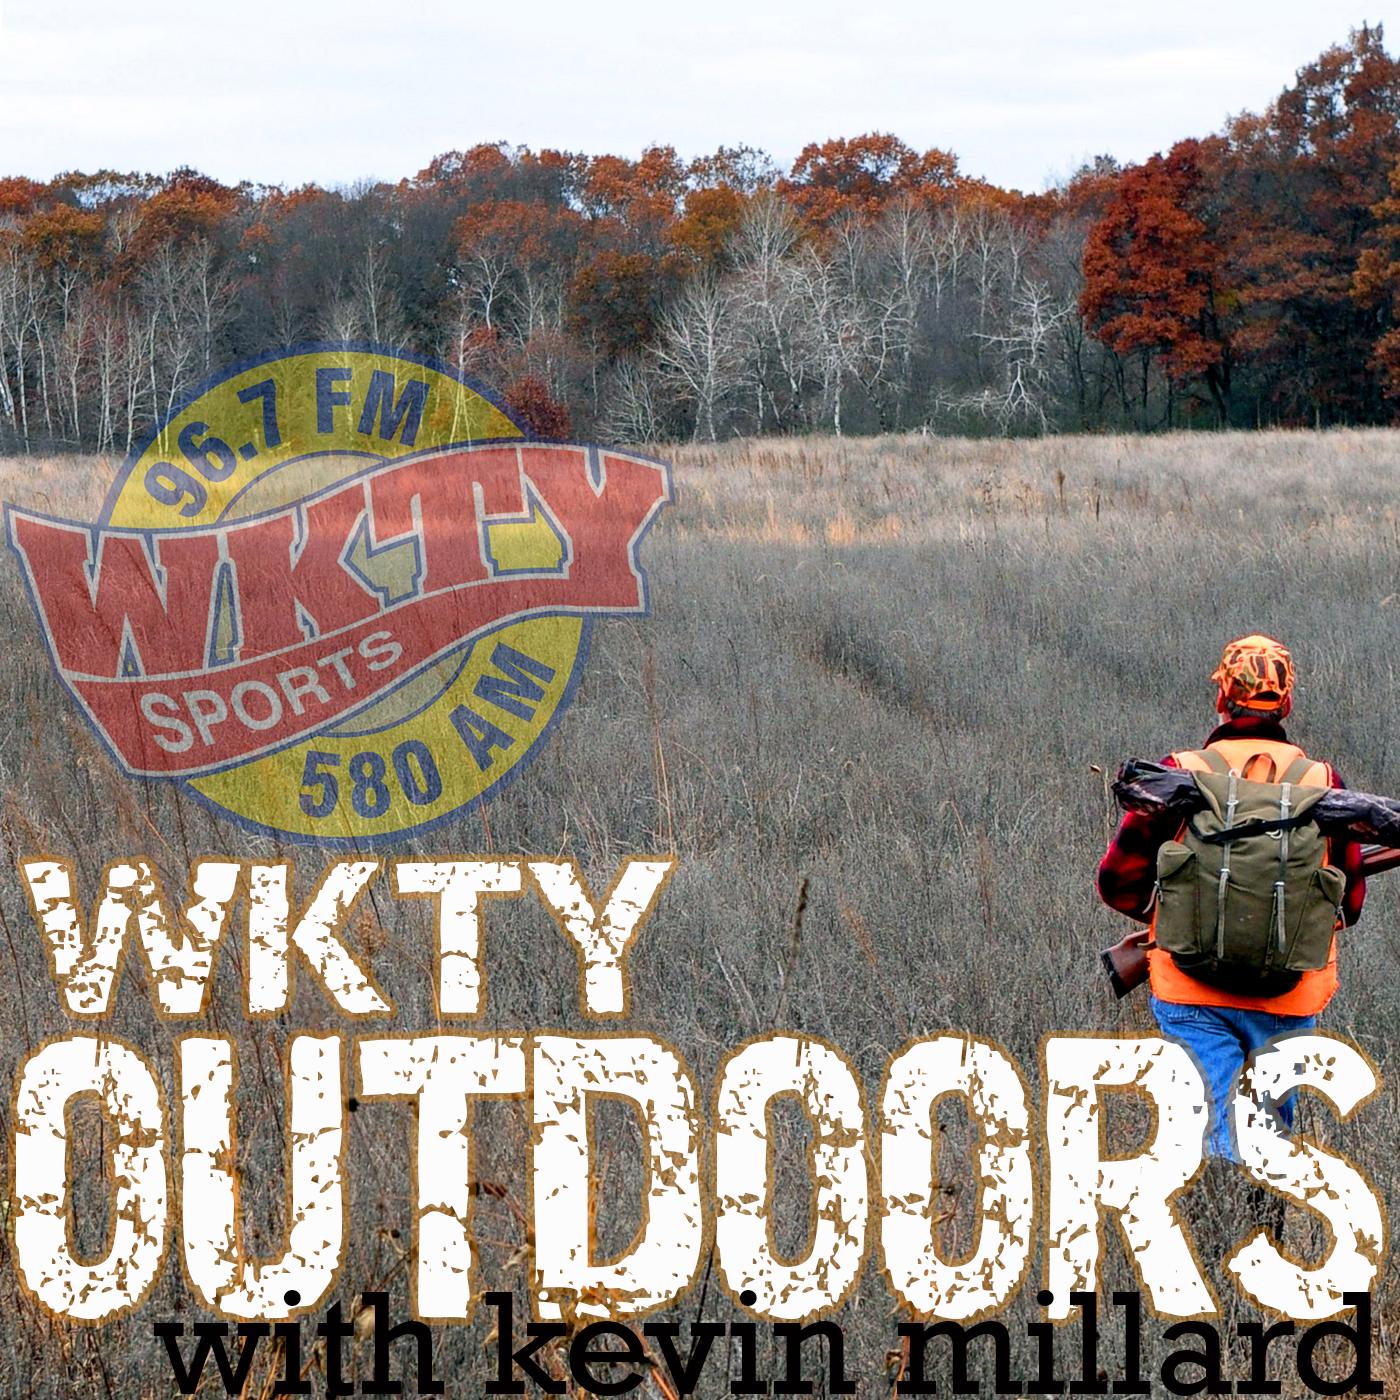 WKTY Outdoors-Fall Walleye Fishing